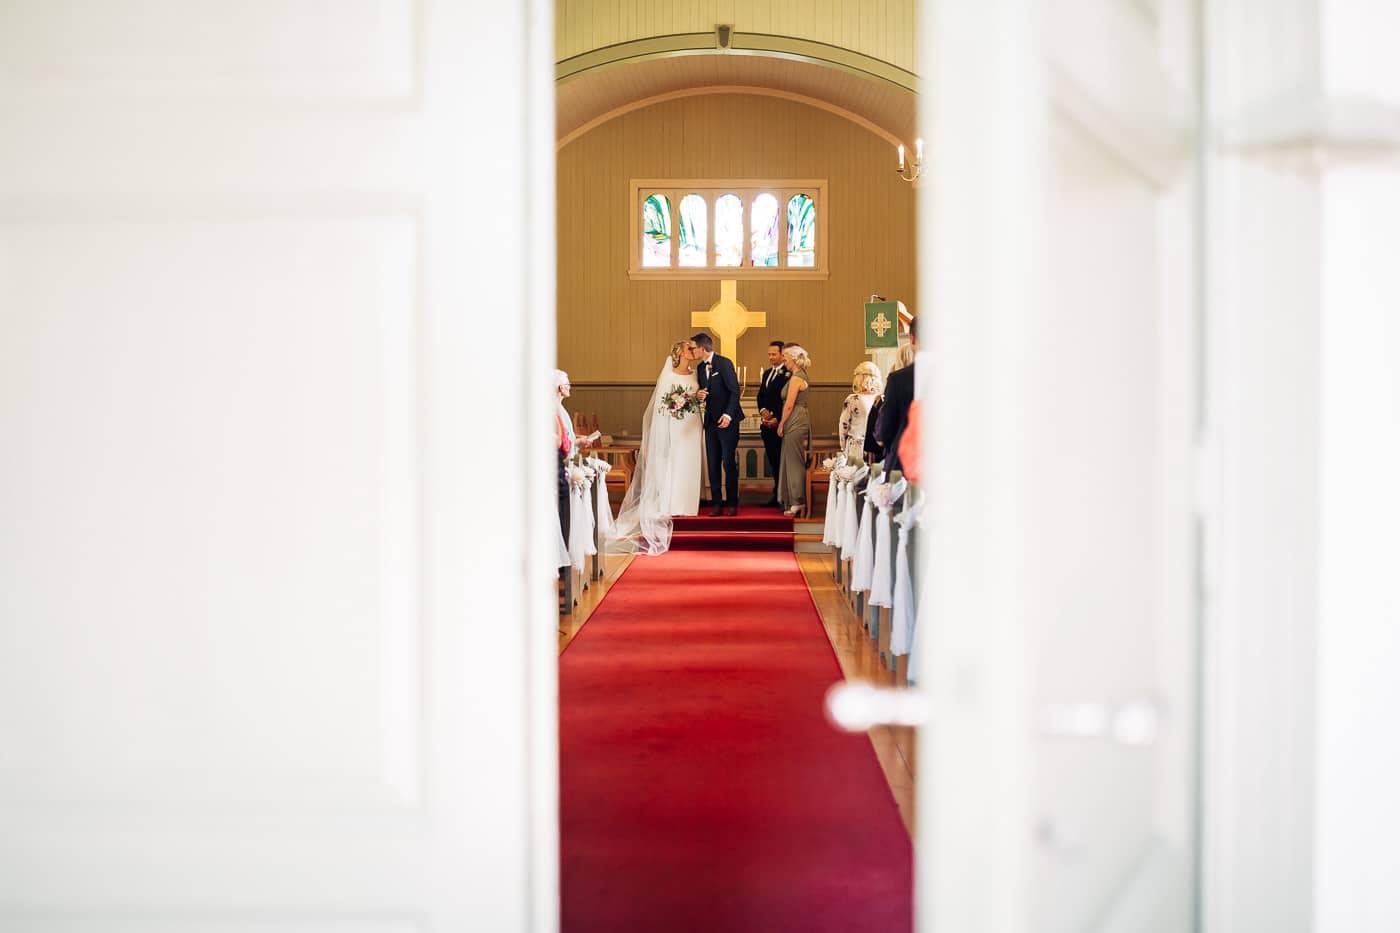 Karoline & Andreas - bryllup i Østfold med magiske detaljer Bryllup Fredrikstad Fotograf 26